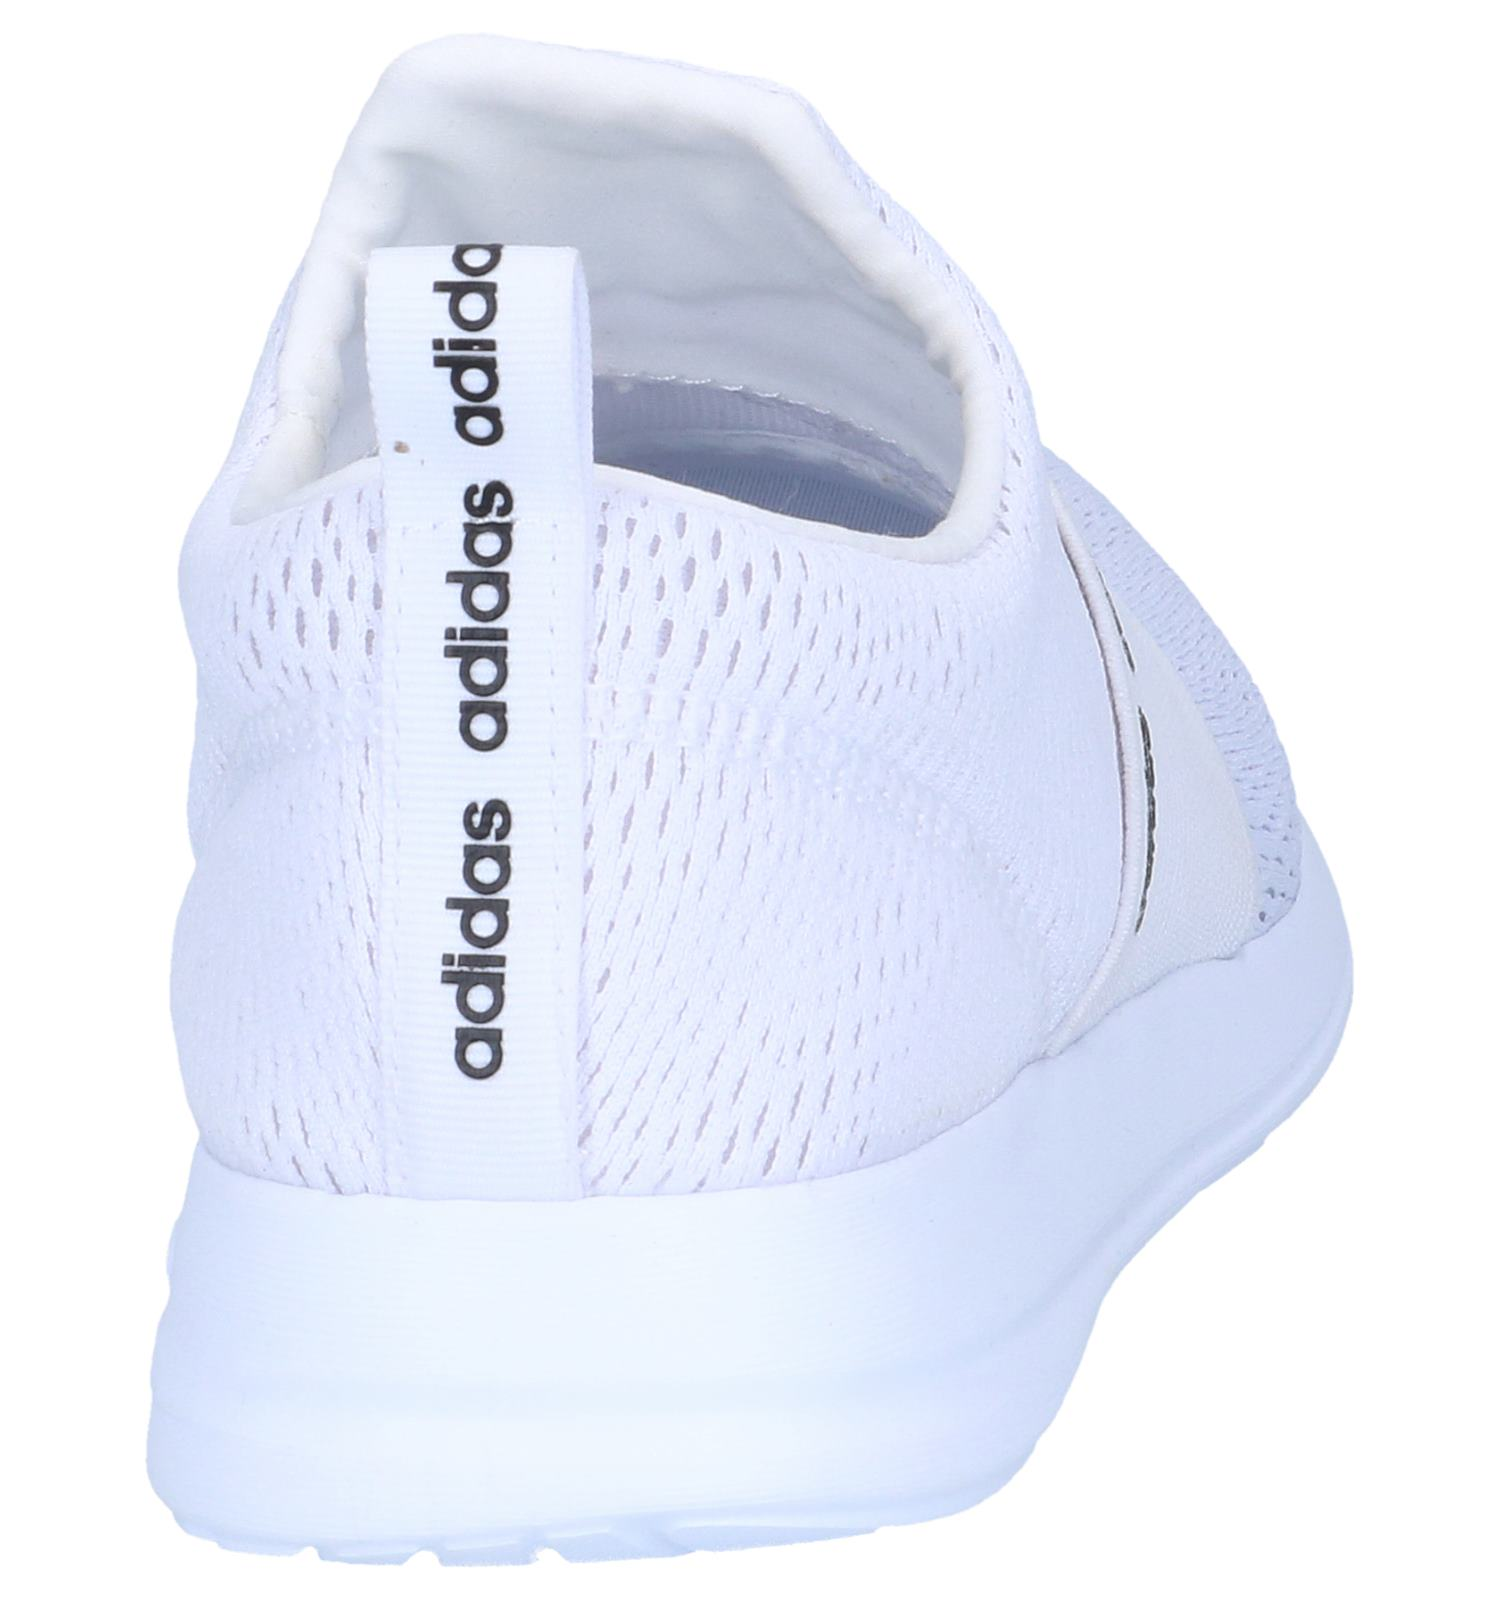 Witte Slip on Sneakers adidas Refine Adapt | TORFS.BE